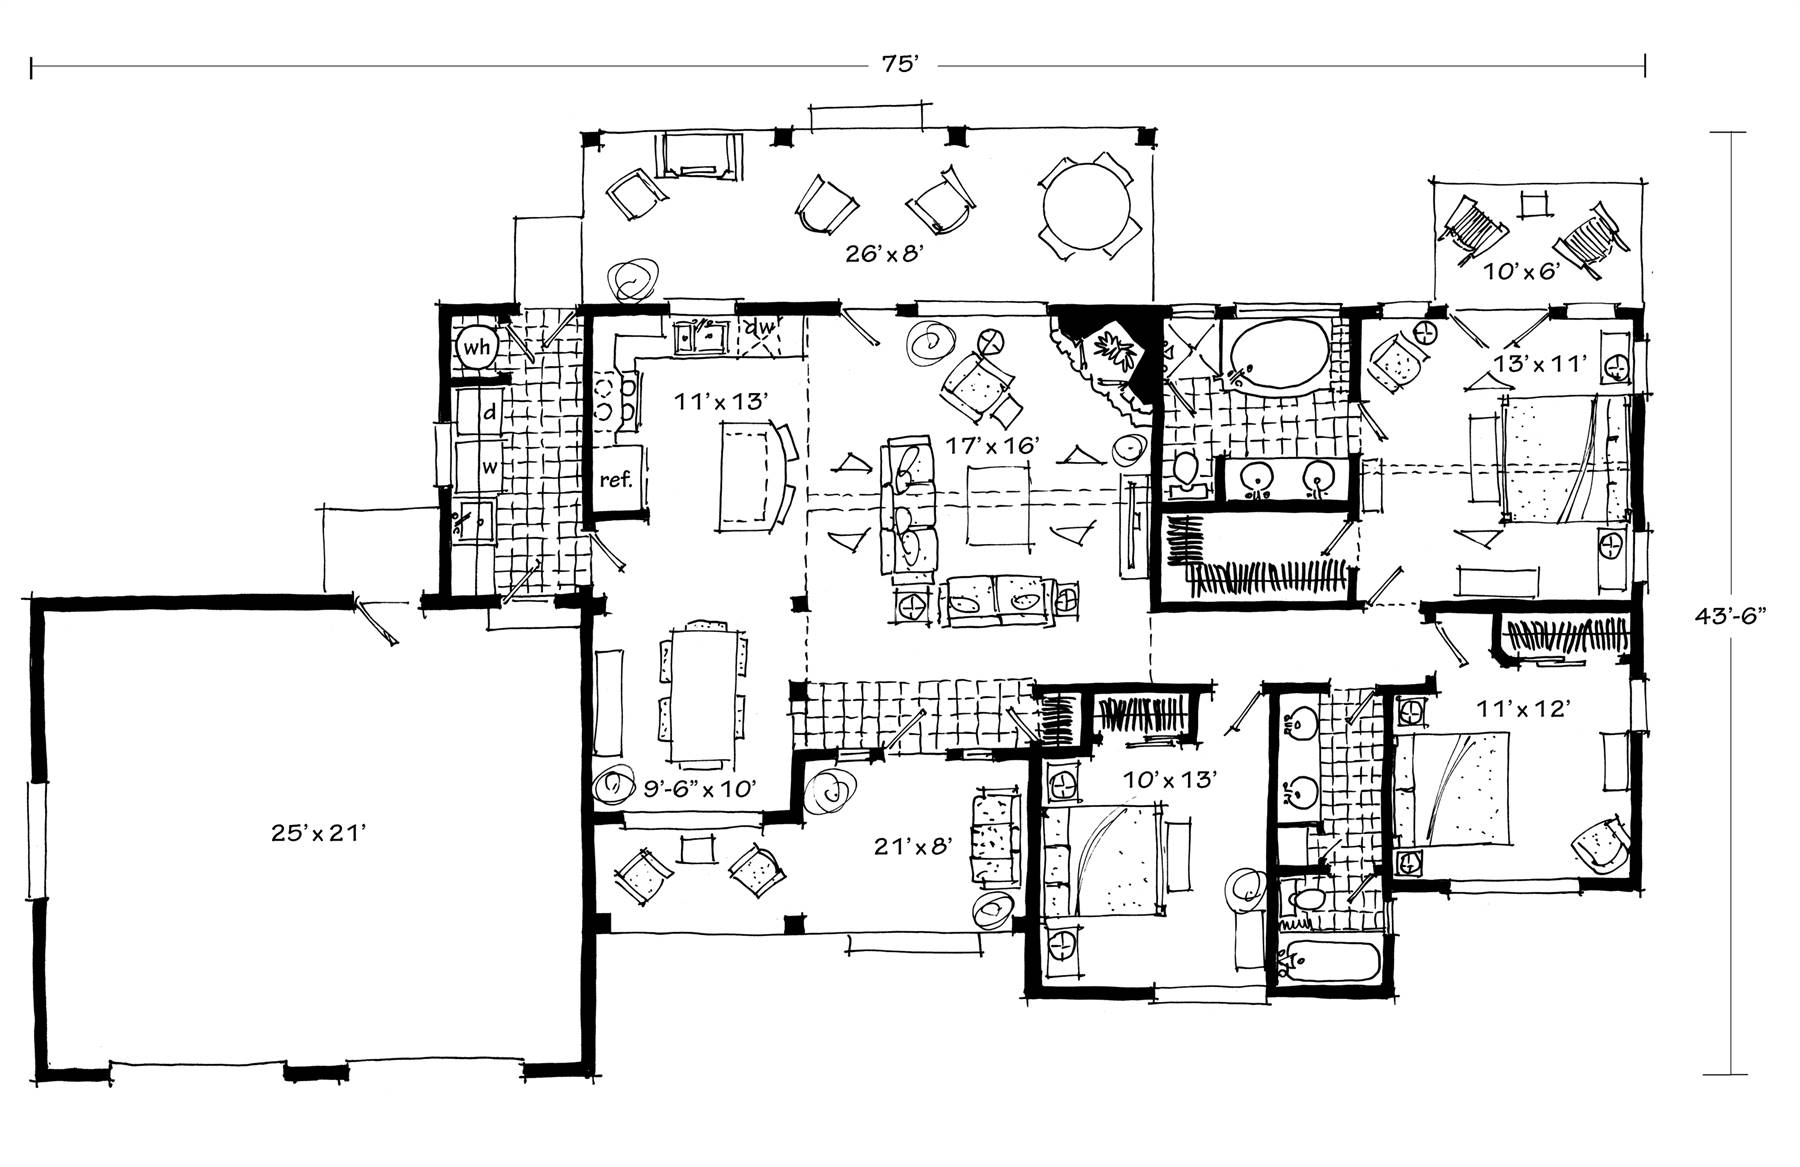 1st Floor Plan image of The Cherokee II House Plan